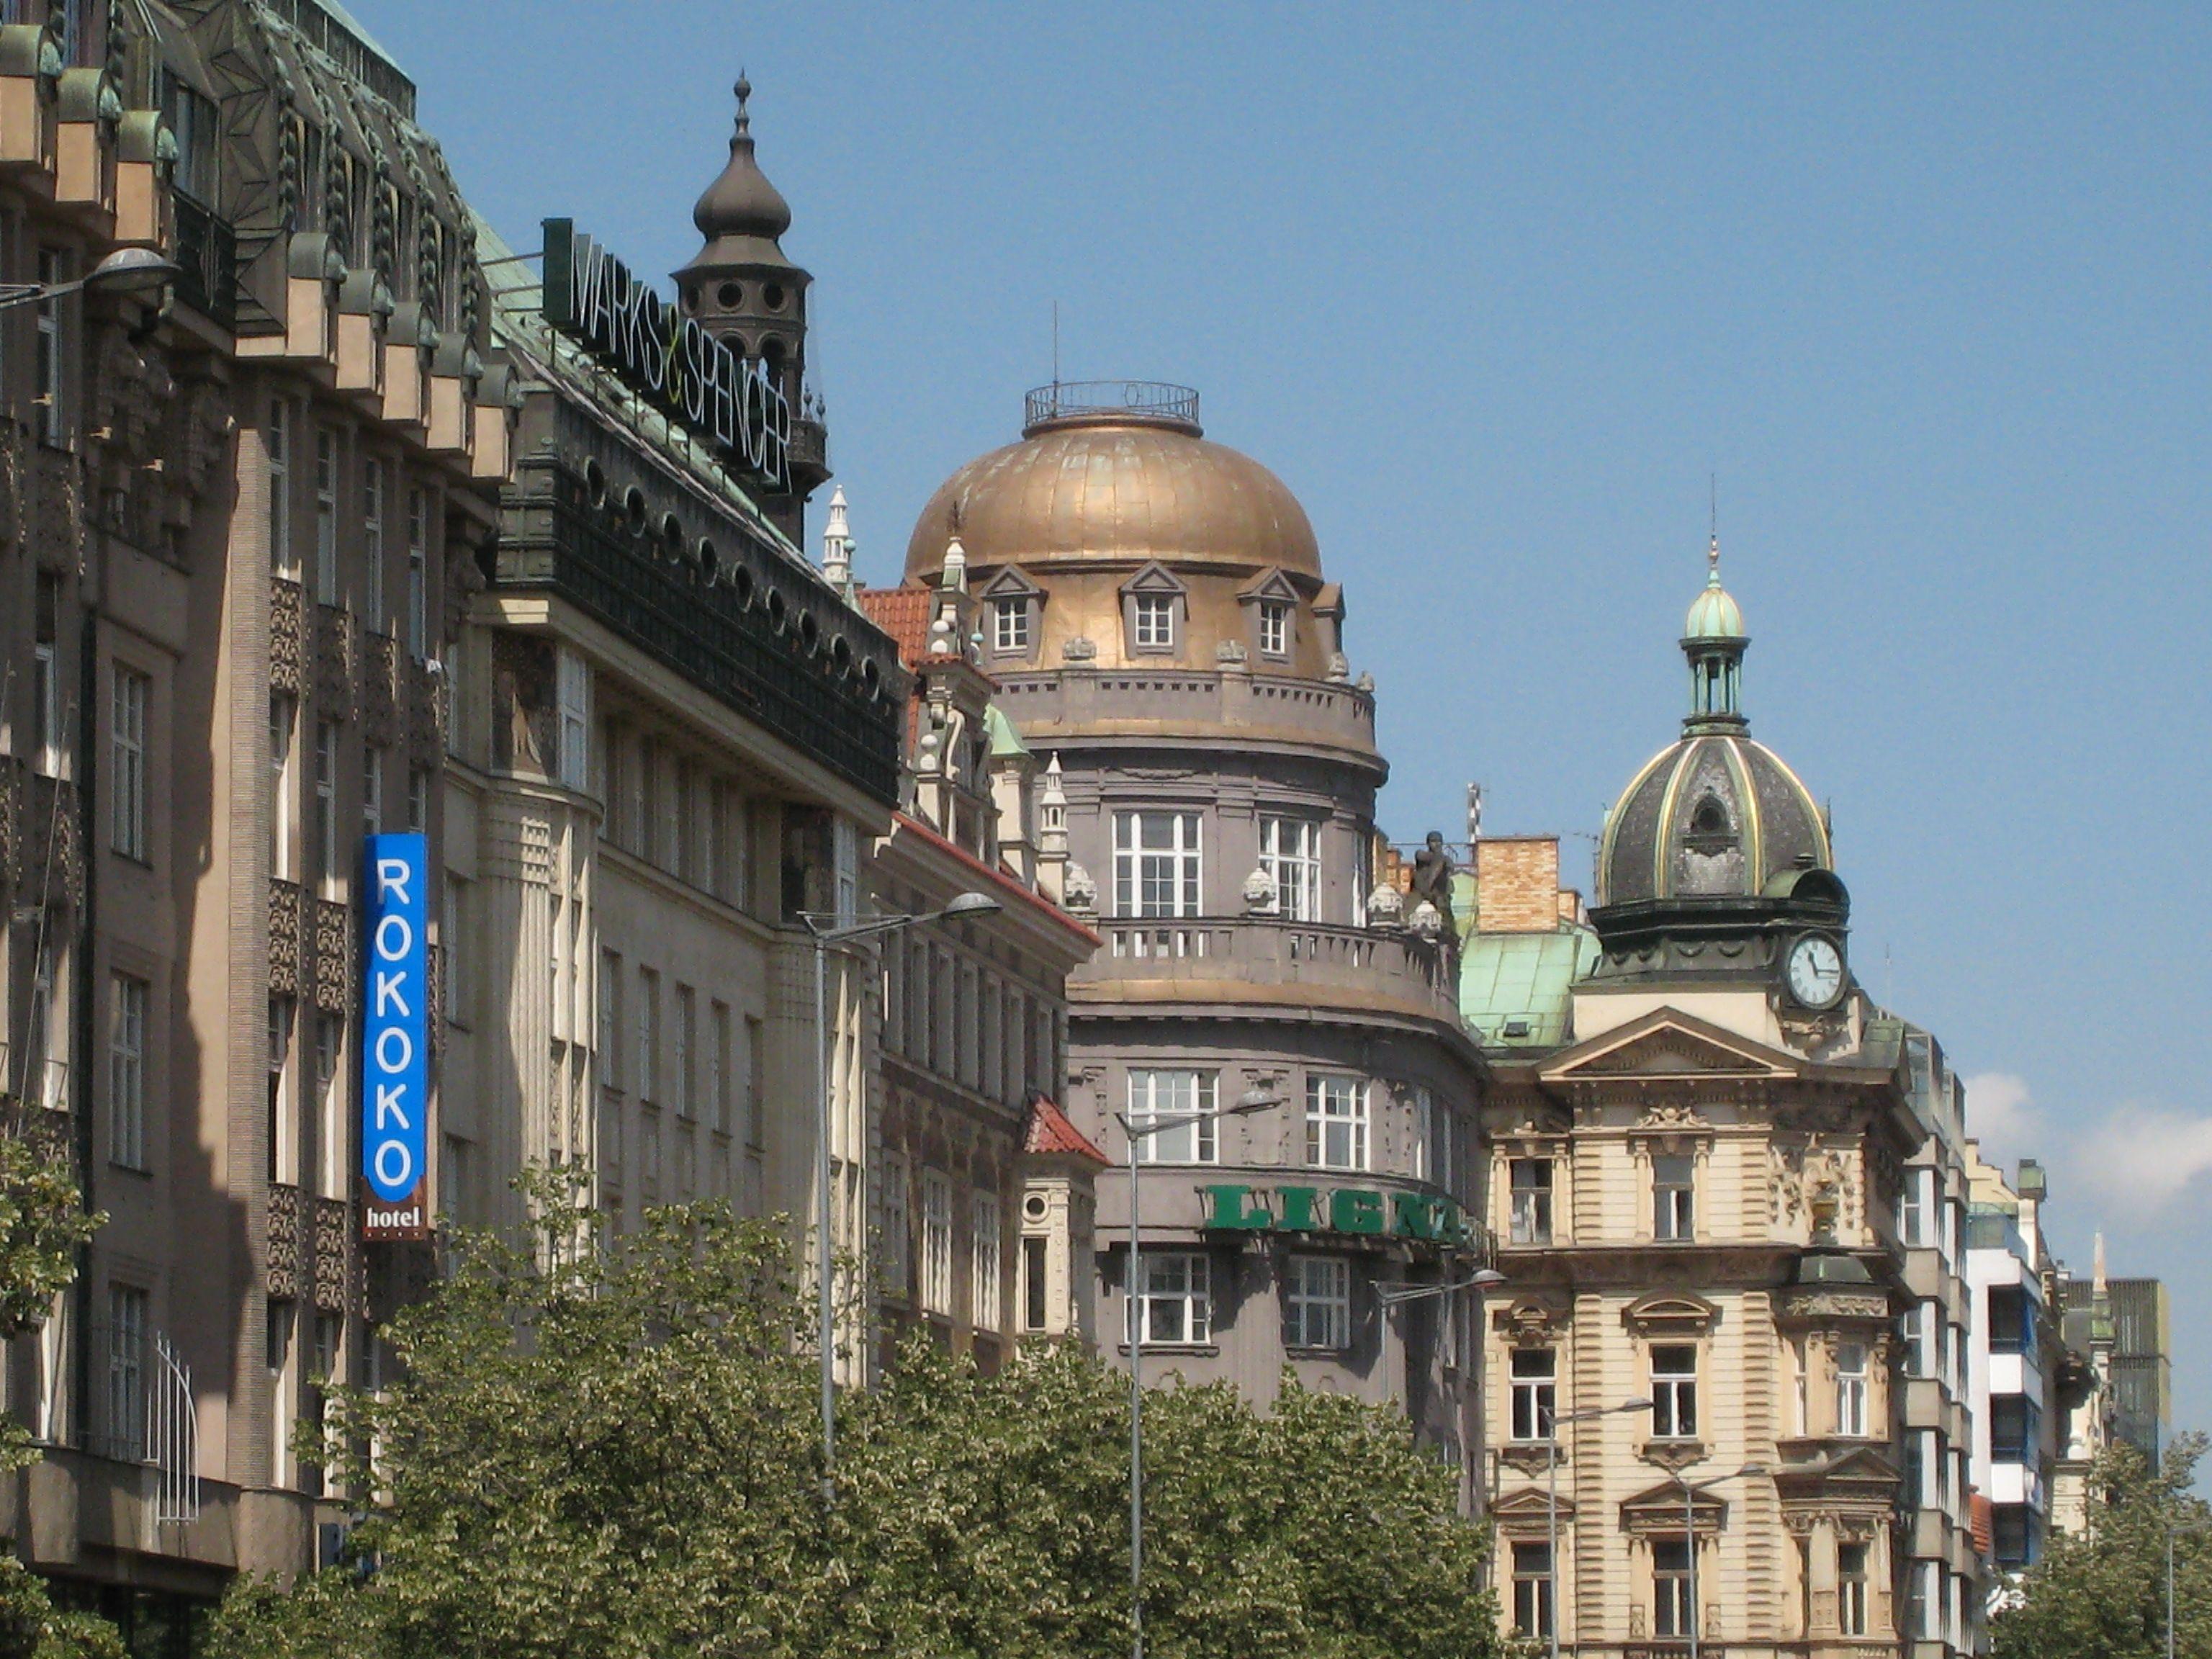 Prague - 2012 - Photo by Martine L.